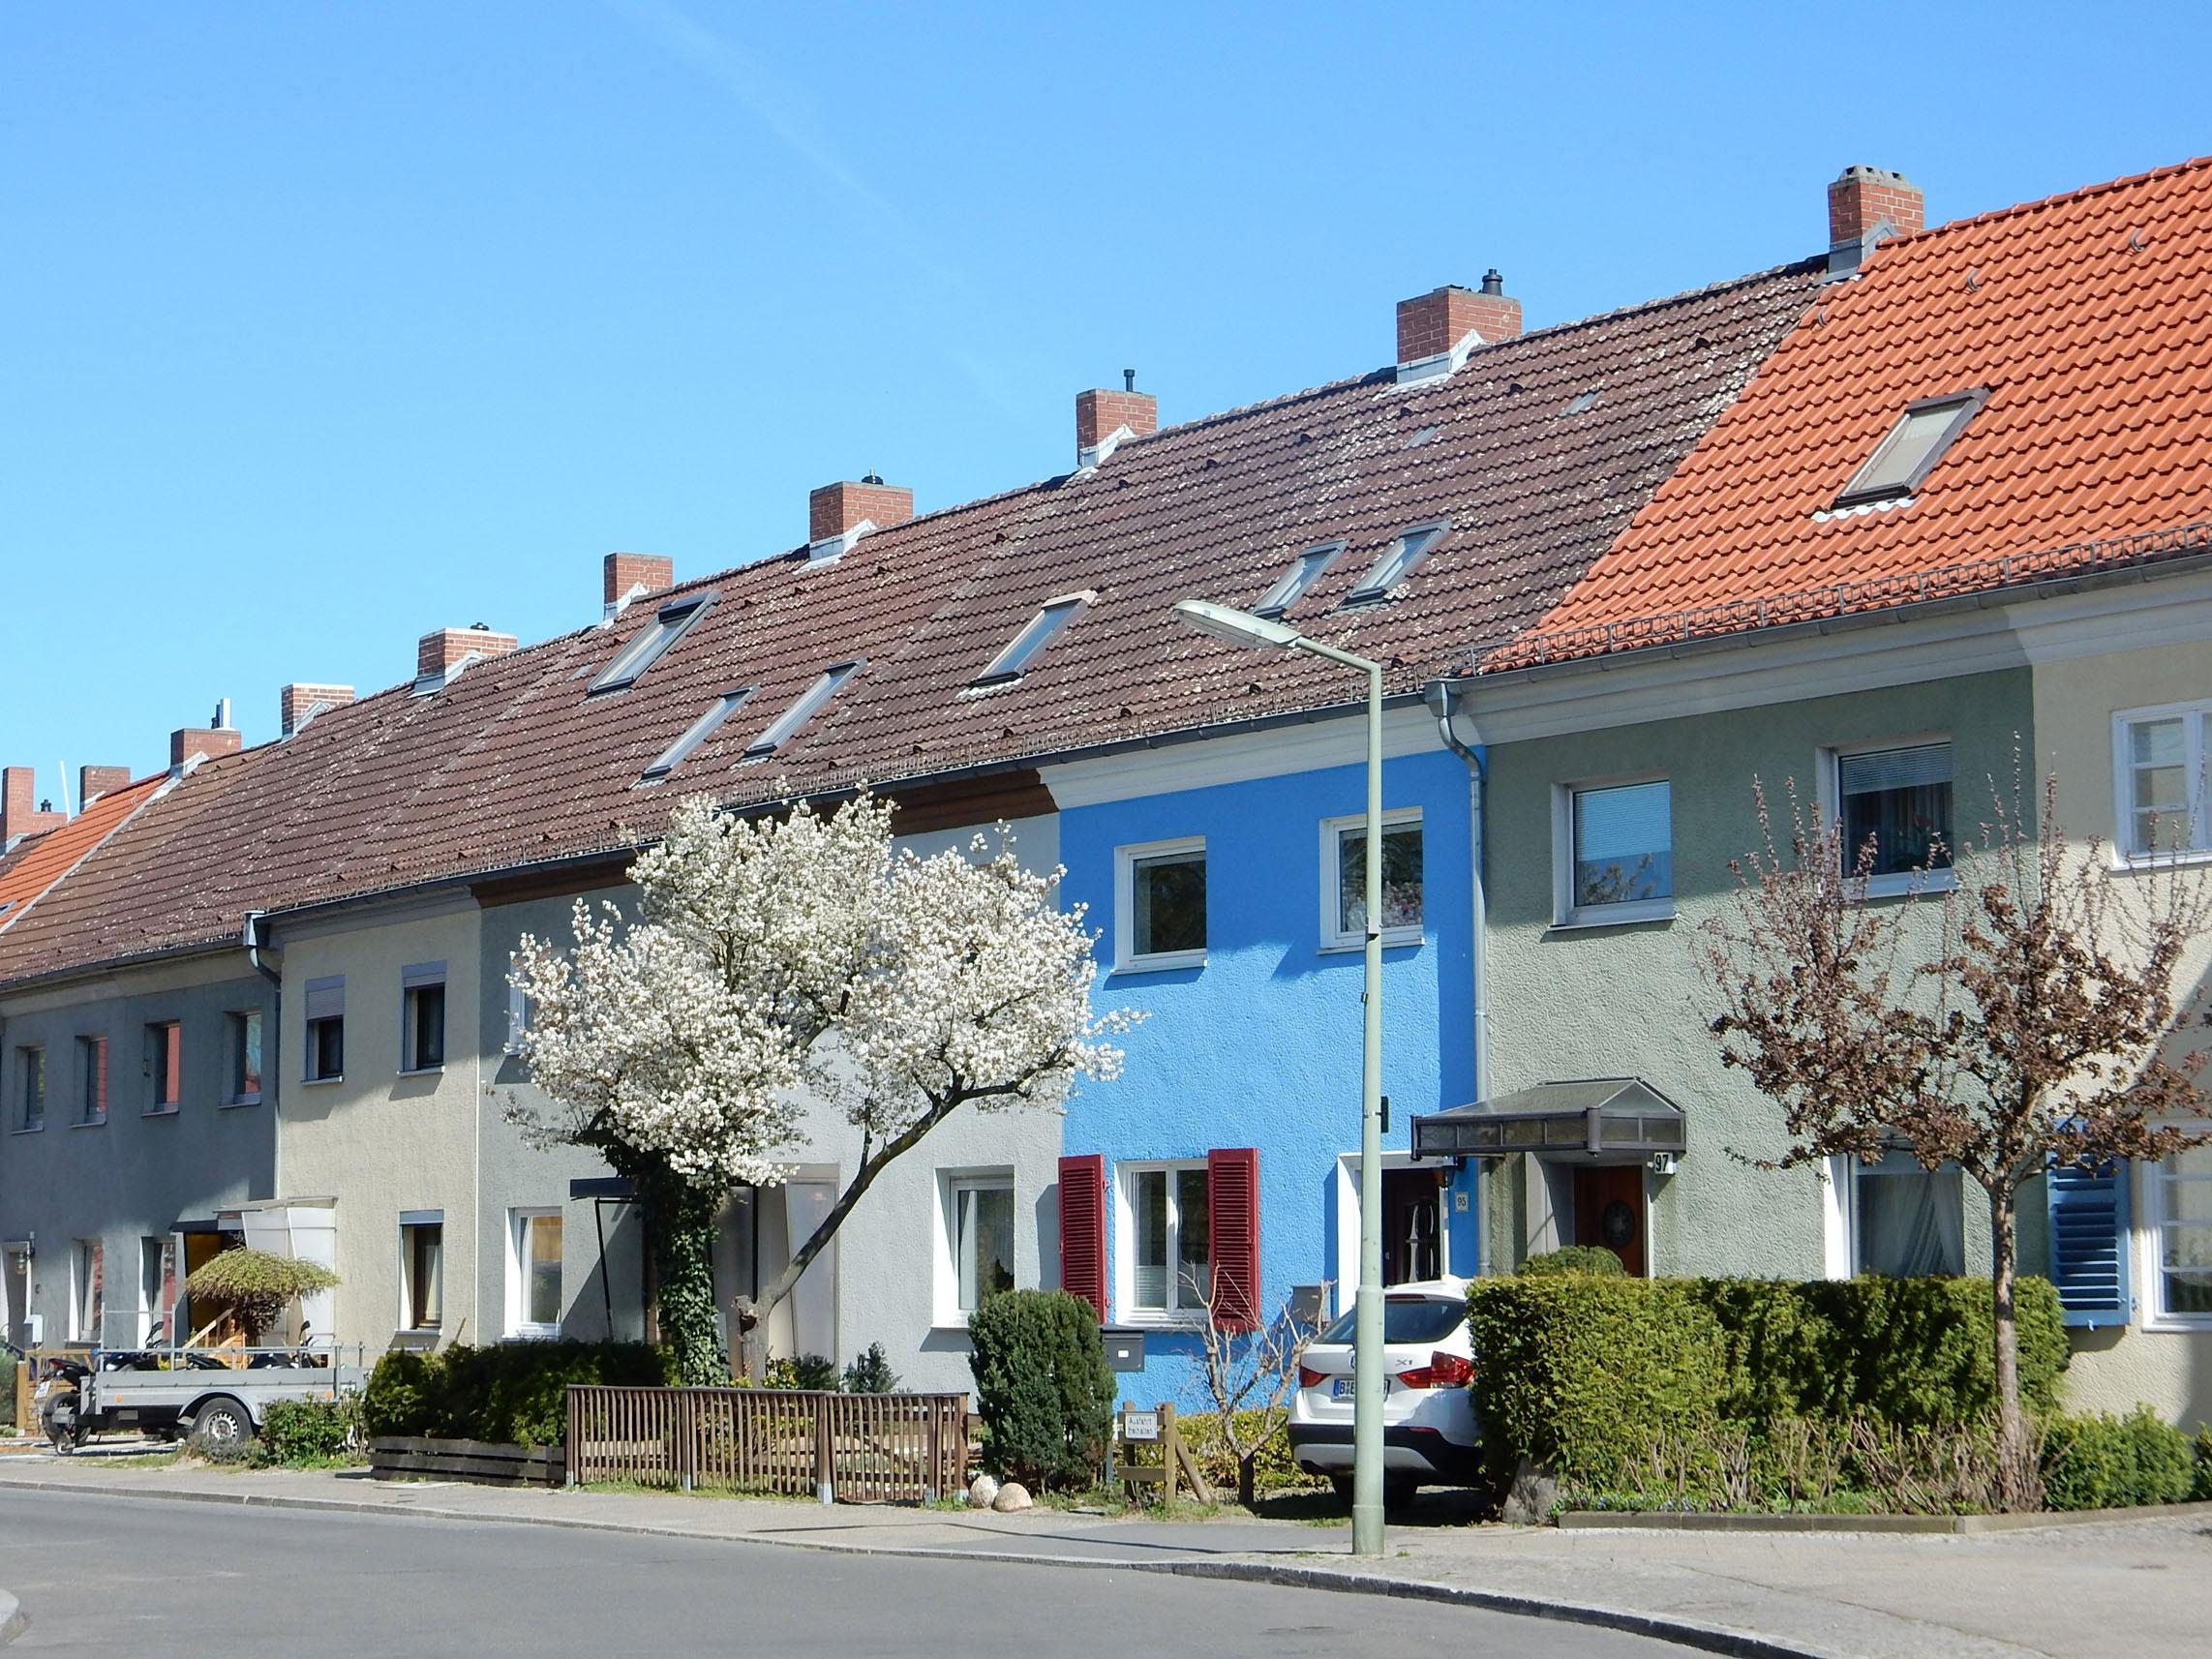 Radtour Berlin Neukölln - Hufeisensiedlung